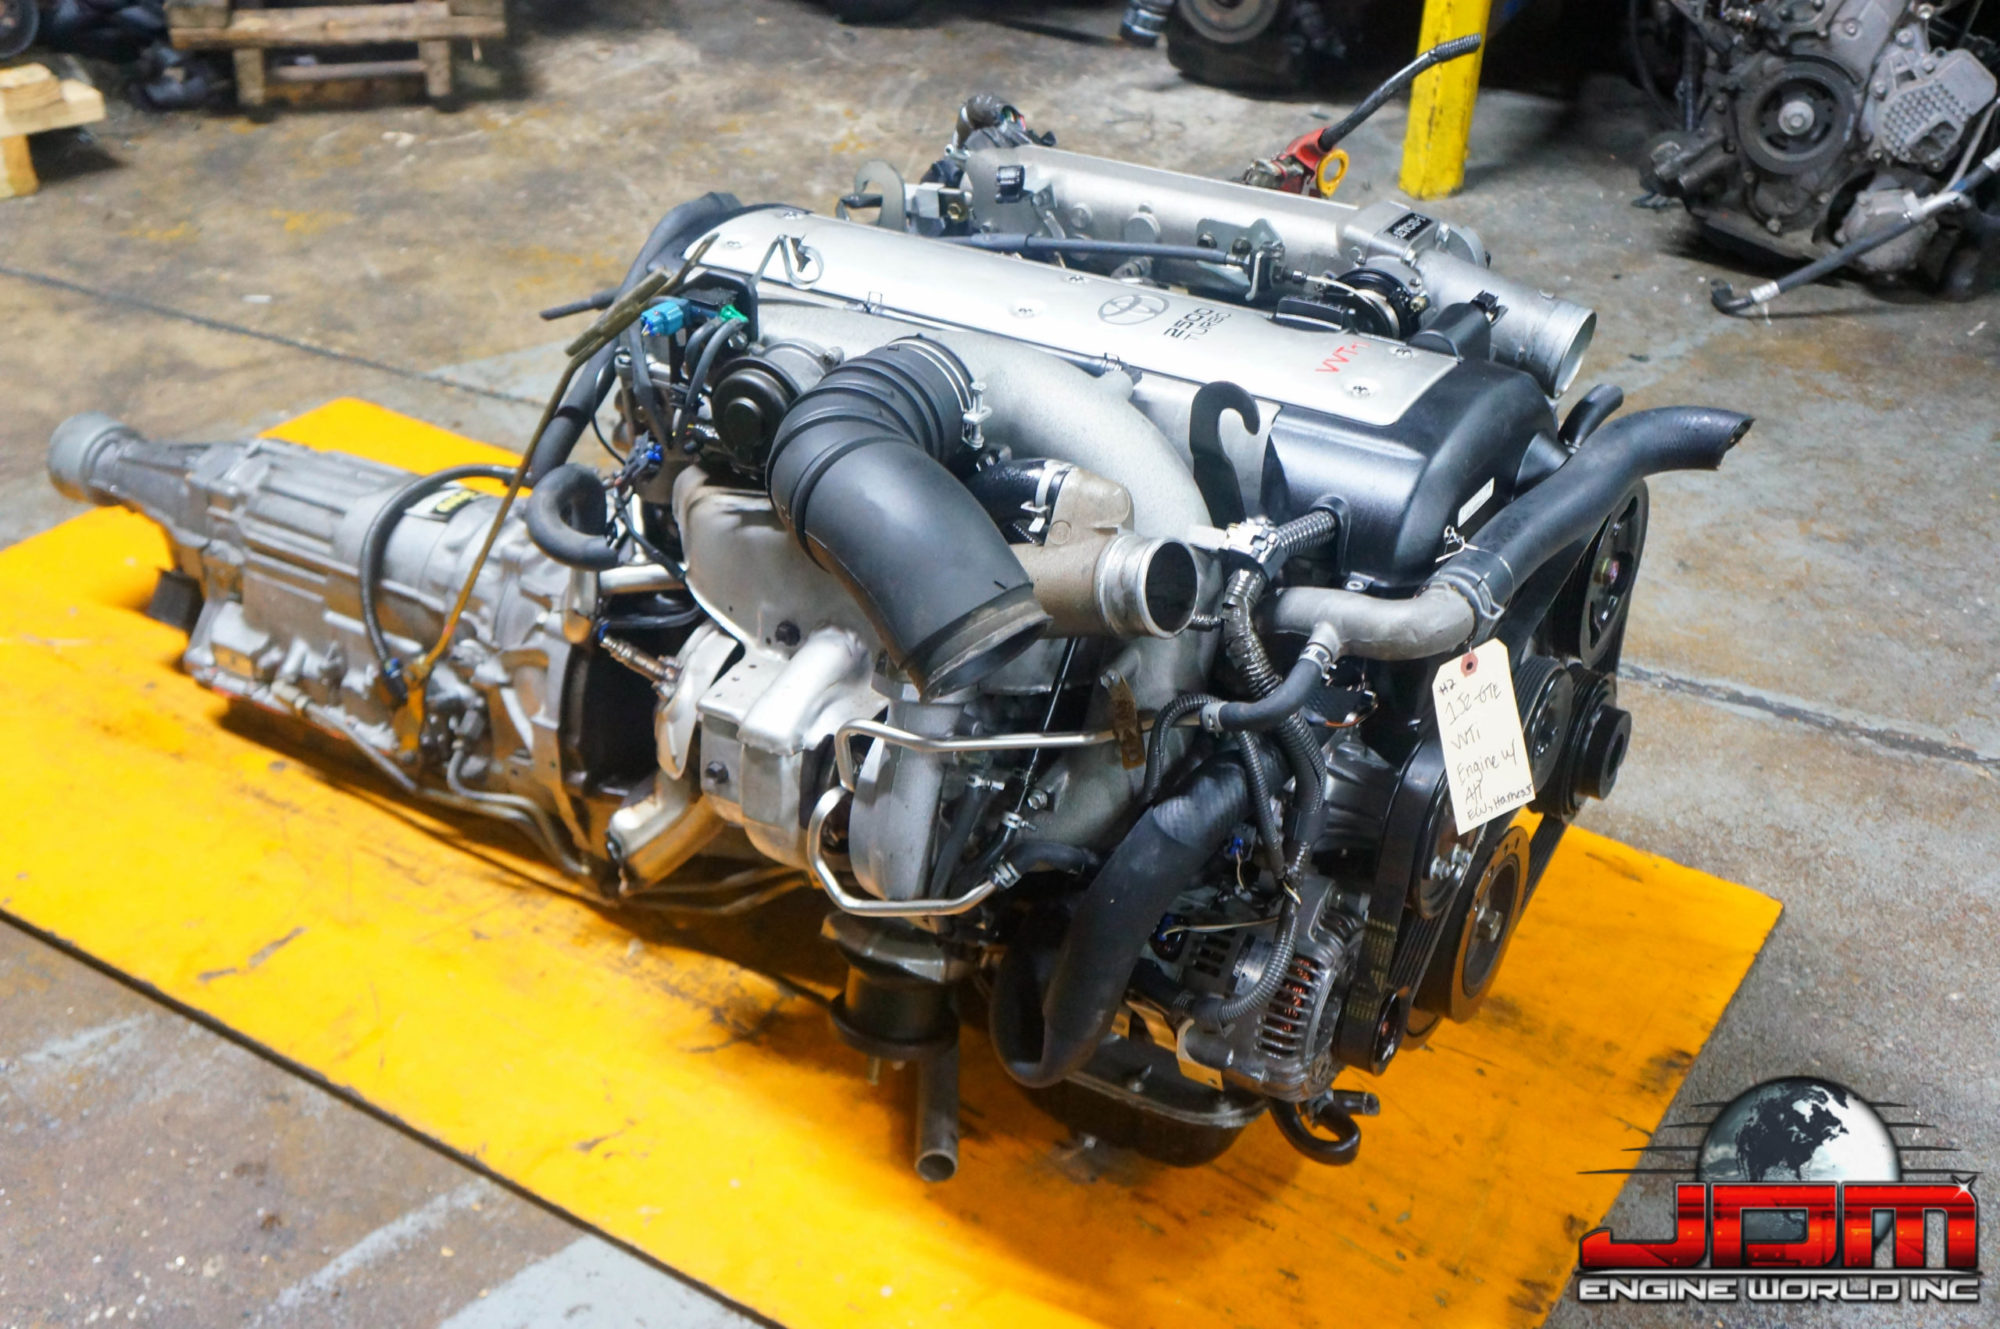 TOYOTA 1JZ-GTE VVTi 2.5L ETCS TURBO FRONT SUMP ENGINE & AUTOMATIC TRANSMISSION JDM 1JZ #2